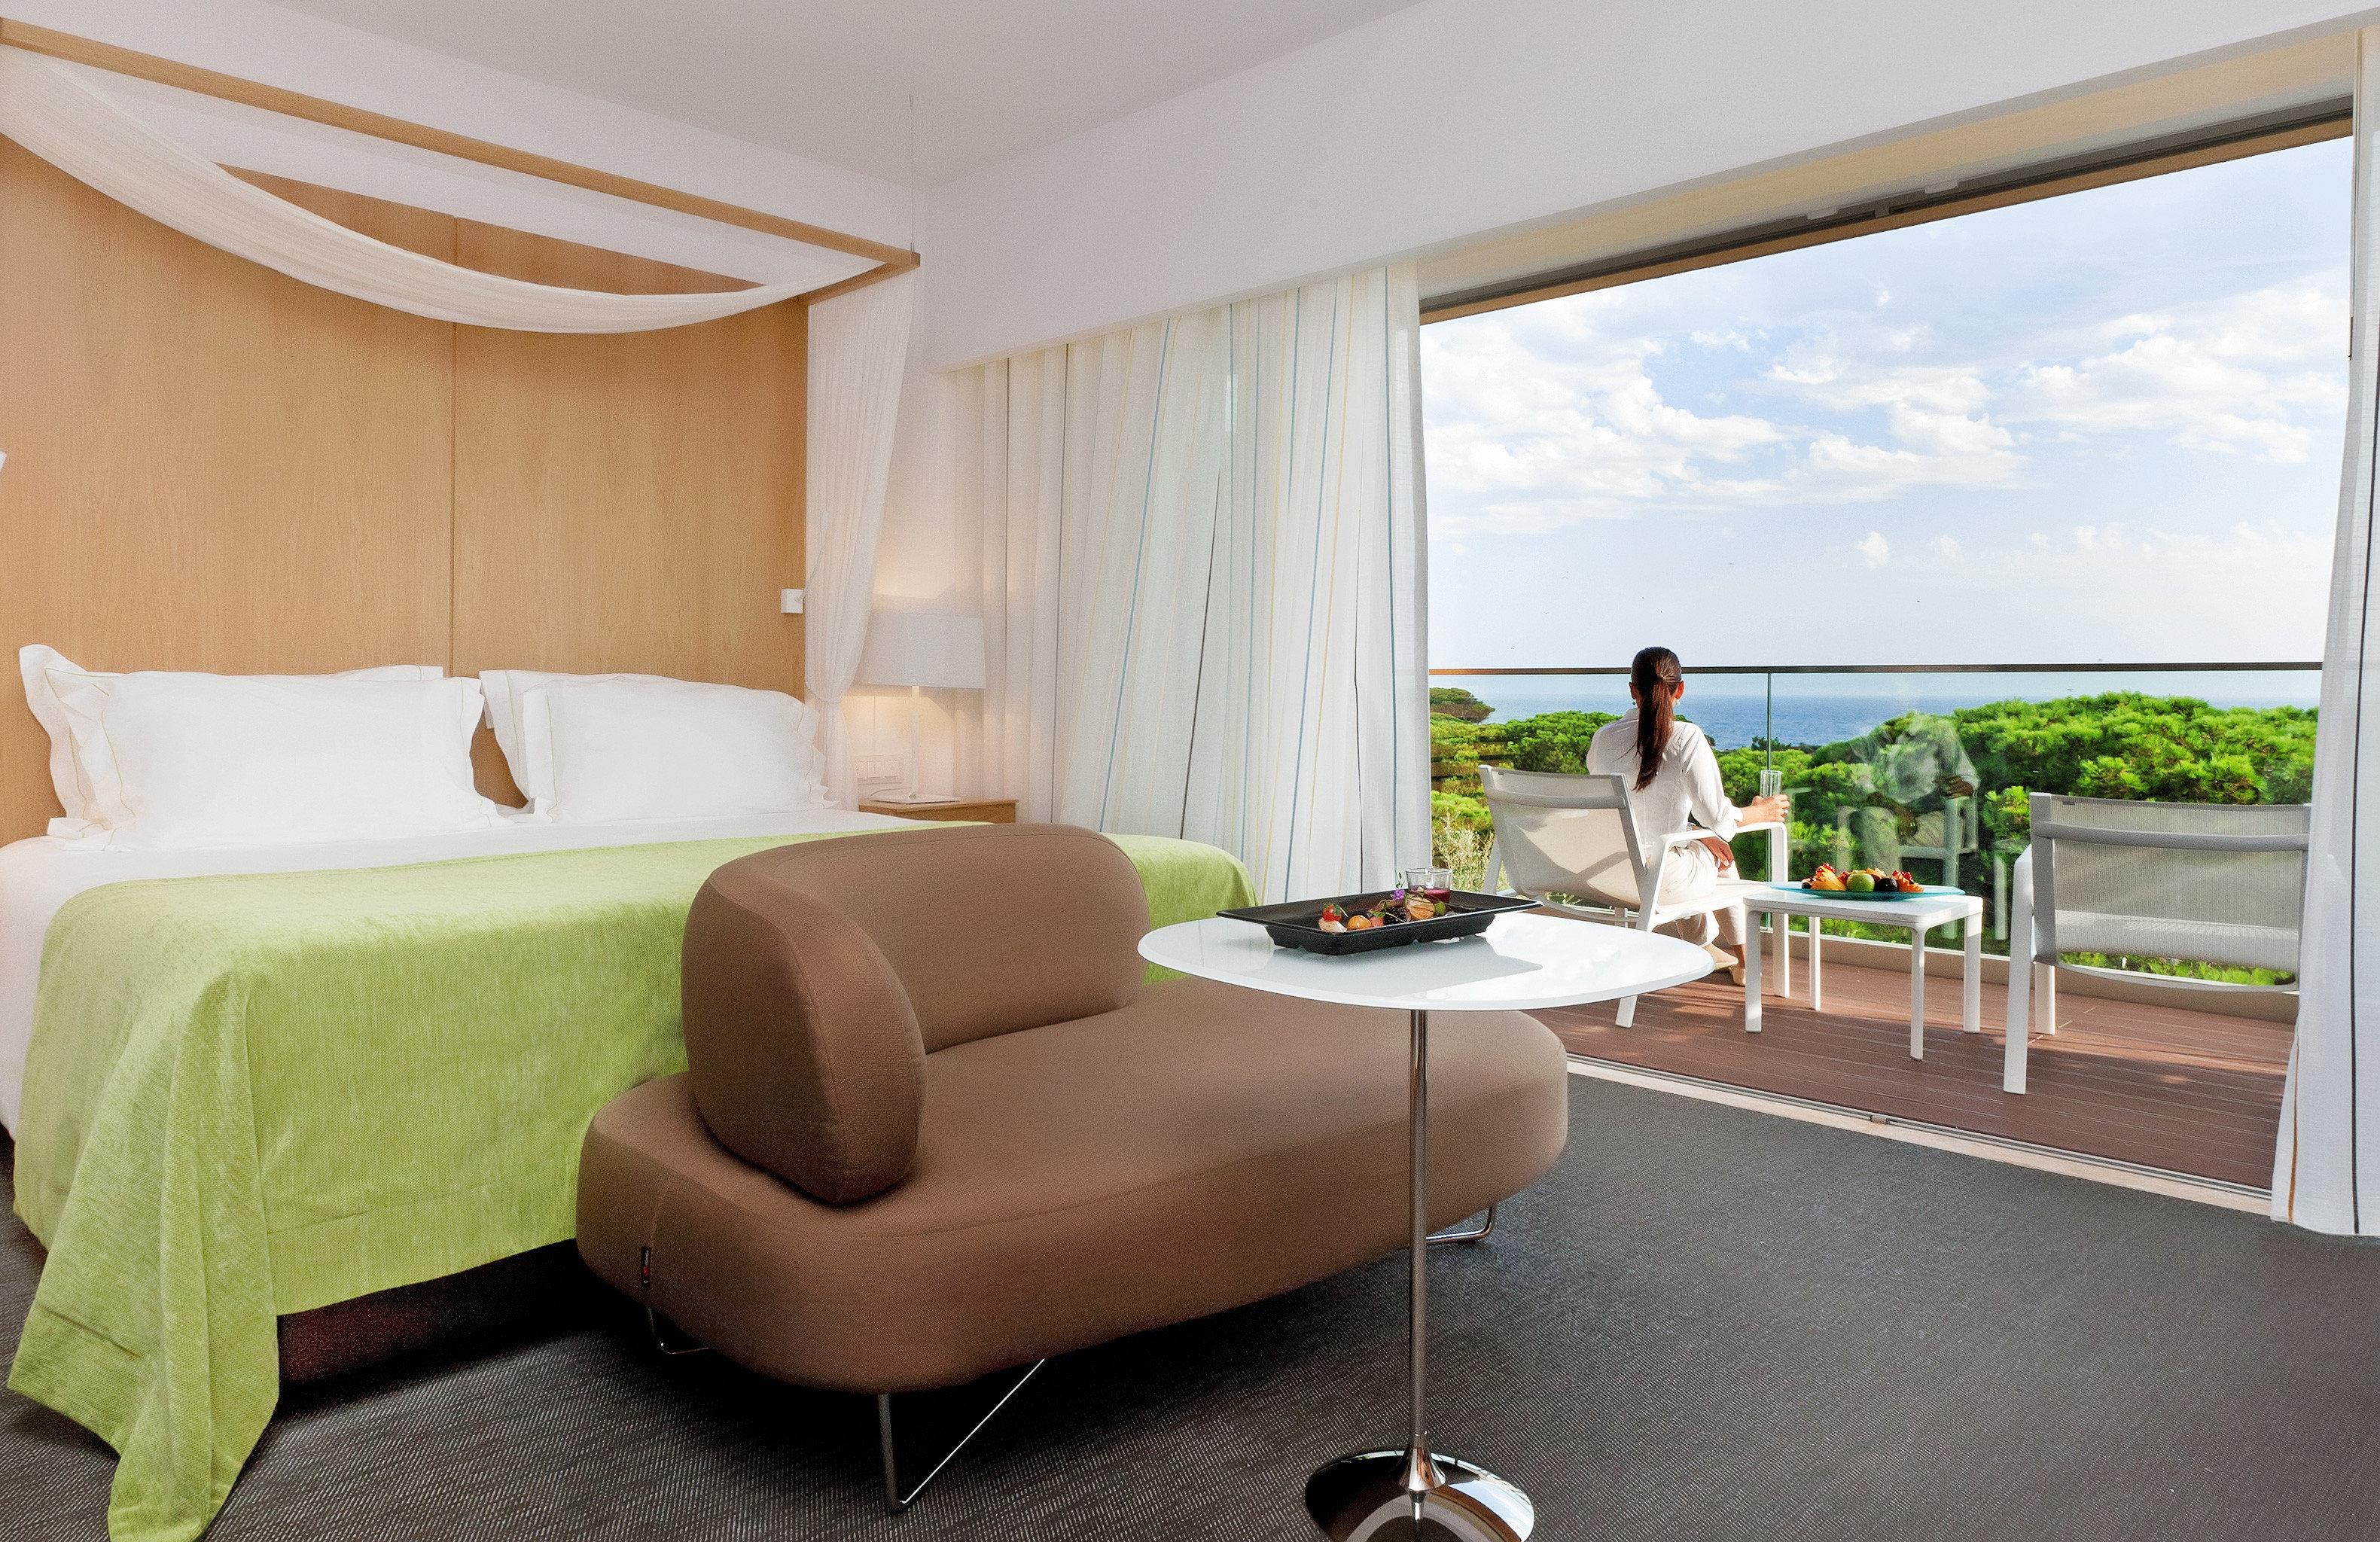 Balcony Bedroom Luxury Scenic views Suite Tropical property living room home cottage condominium Villa